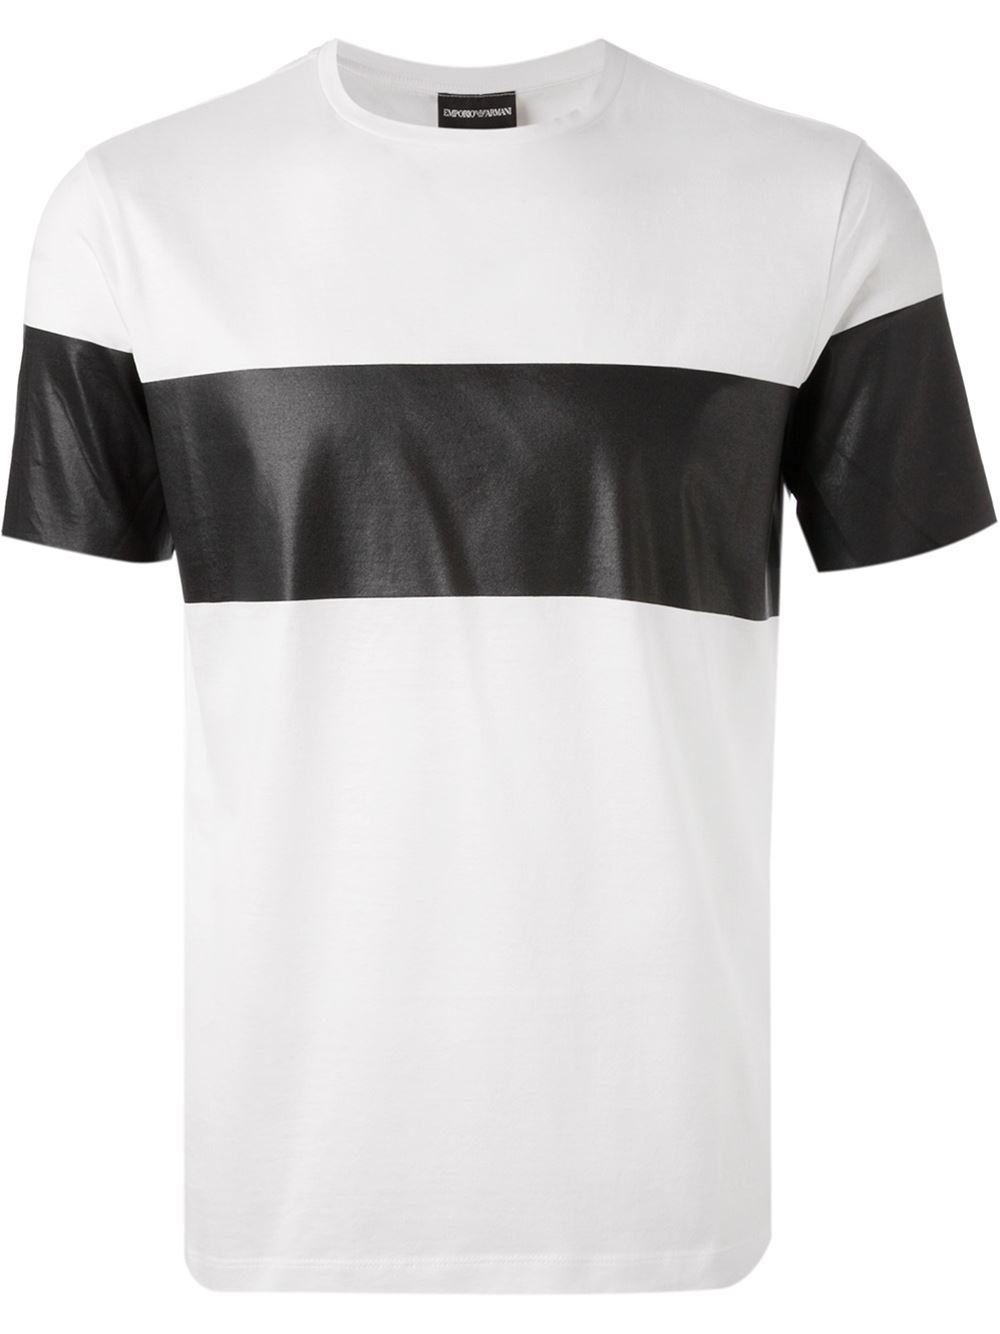 emporio armani contrasting stripe t shirt in white for men. Black Bedroom Furniture Sets. Home Design Ideas